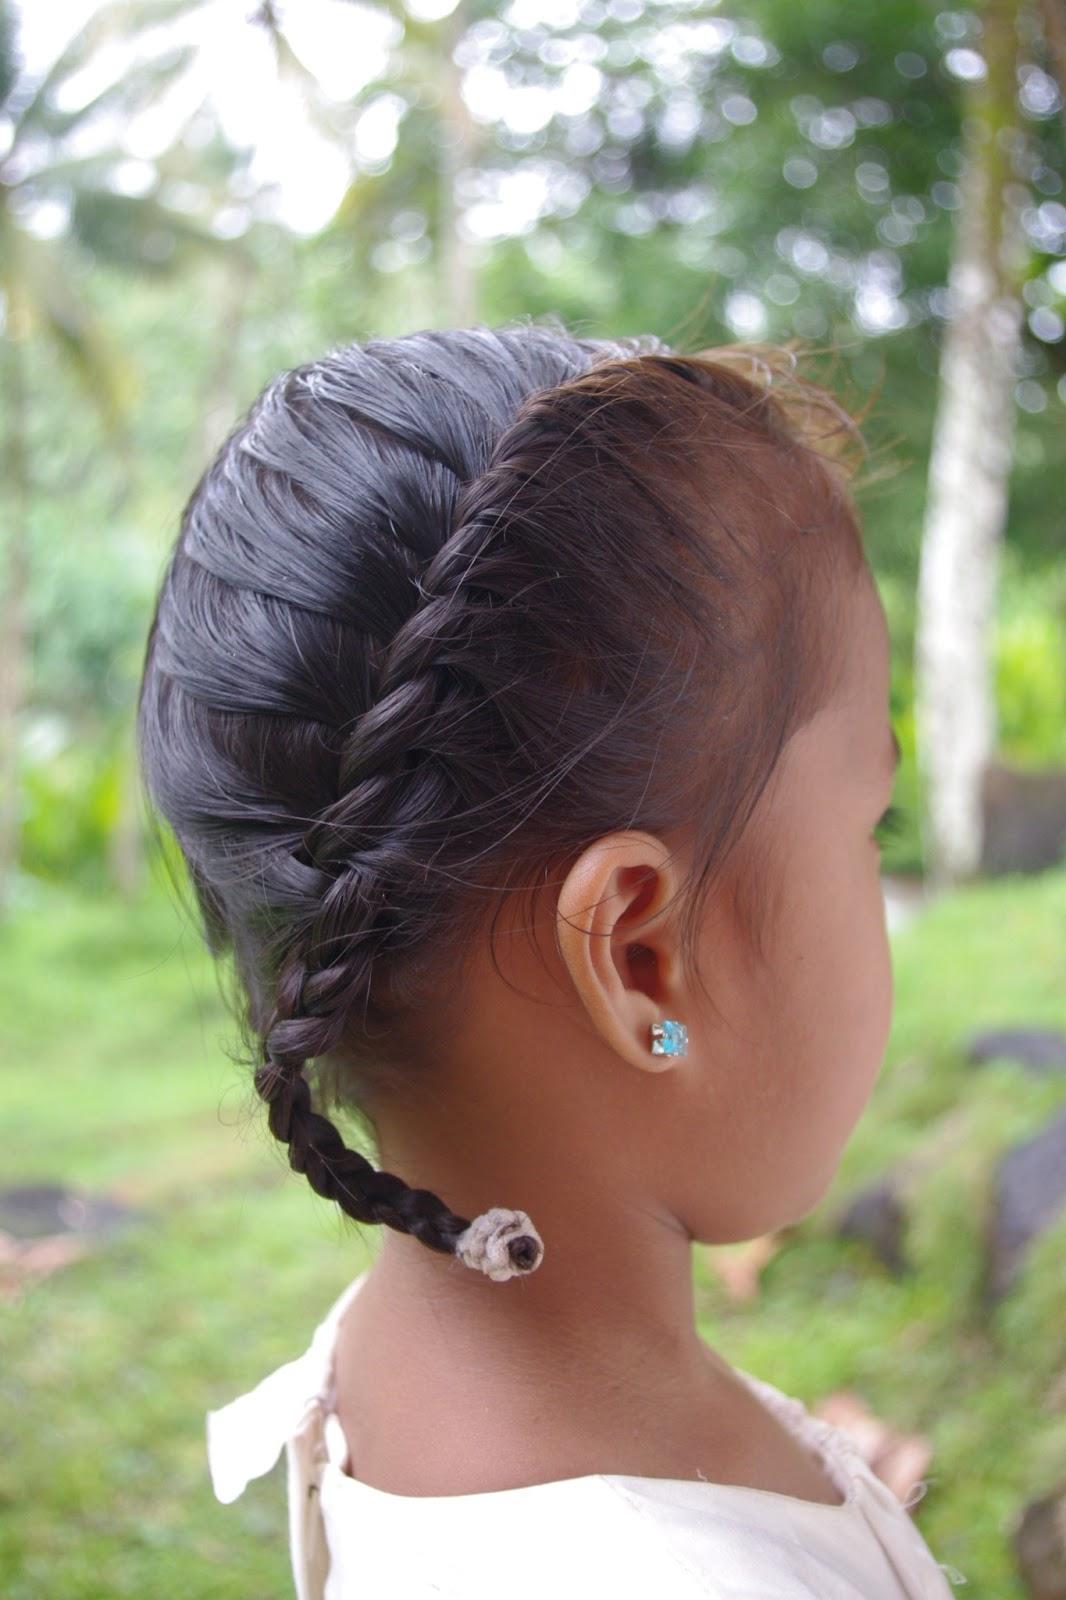 Braids & Hairstyles For Super Long Hair: Micronesian Girl